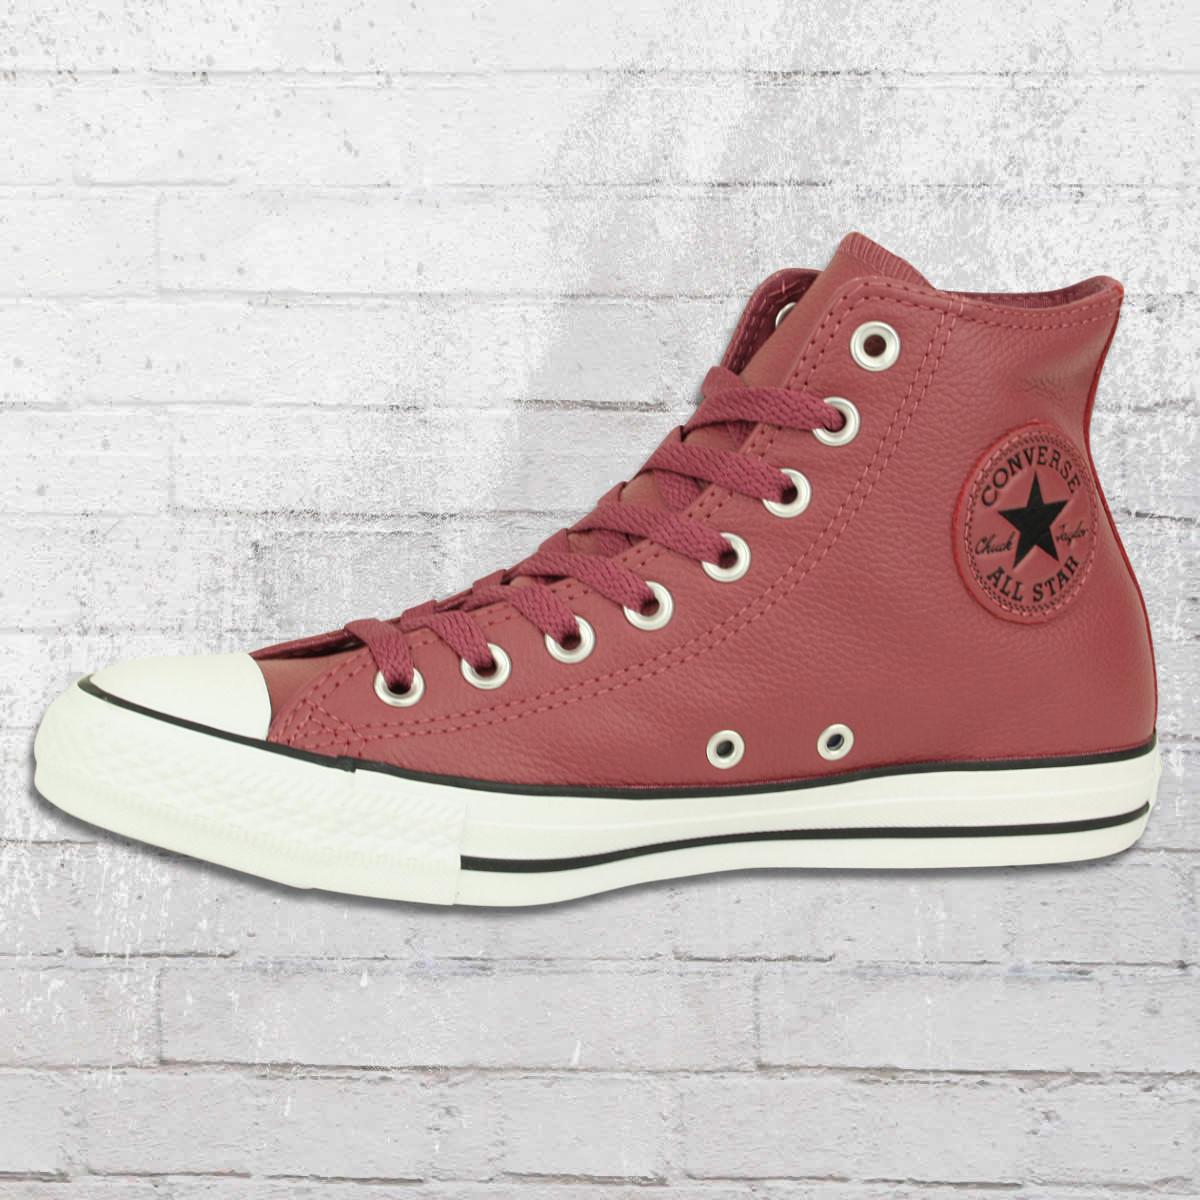 31982a3a94fa Jetzt bestellen   Converse Leder Chucks CT AS HI 157614 C Schuhe ...